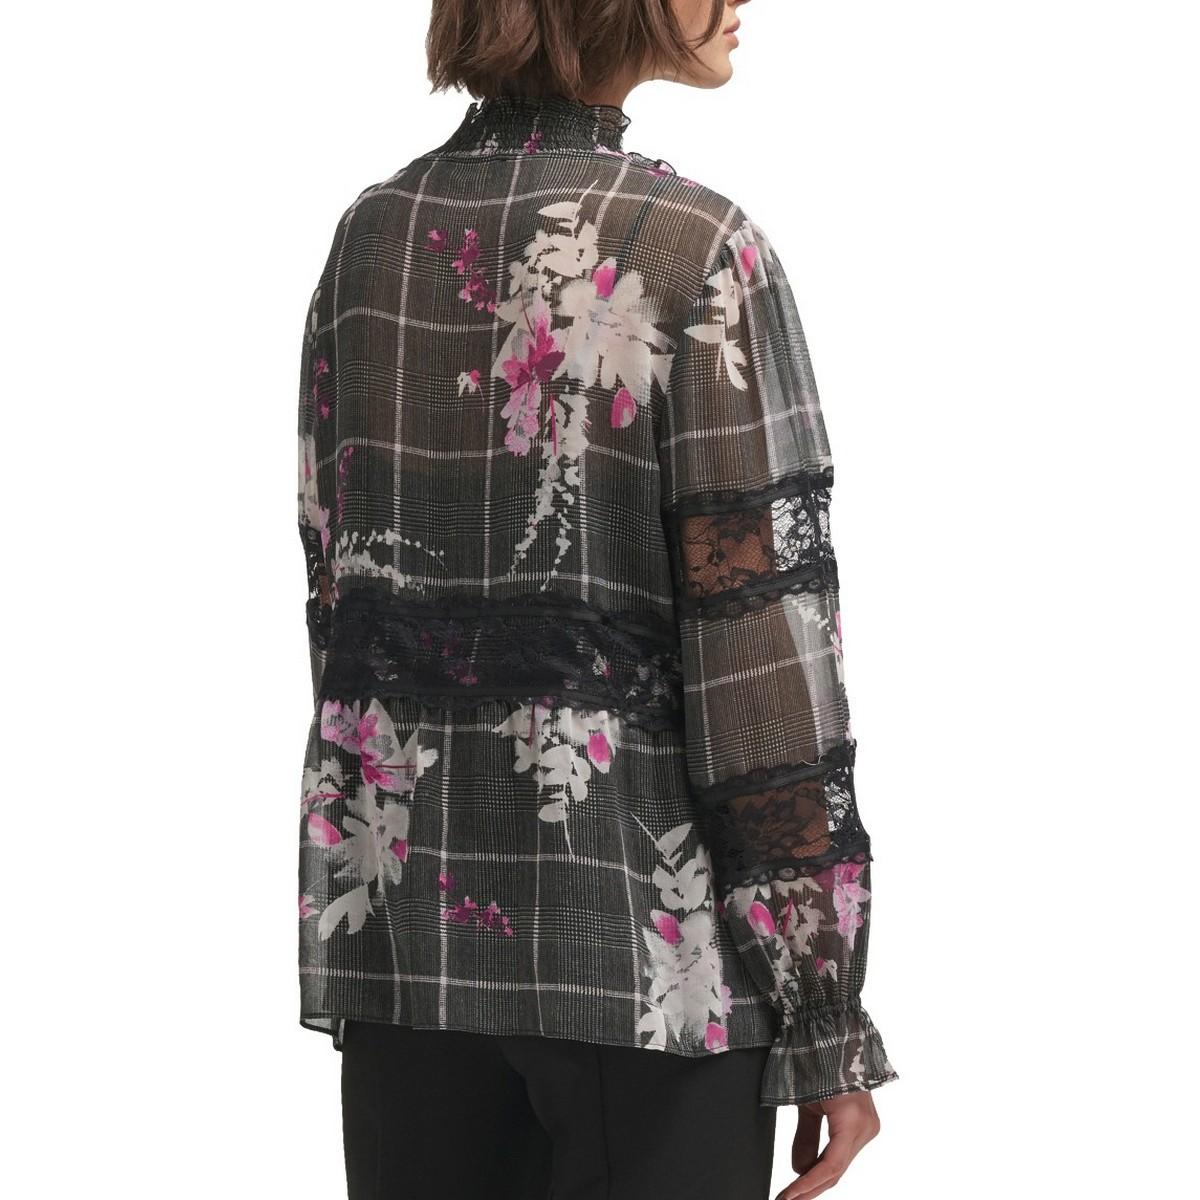 DKNY-NEW-Women-039-s-Lace-trim-Printed-Sheer-Blouse-Shirt-Top-TEDO thumbnail 4